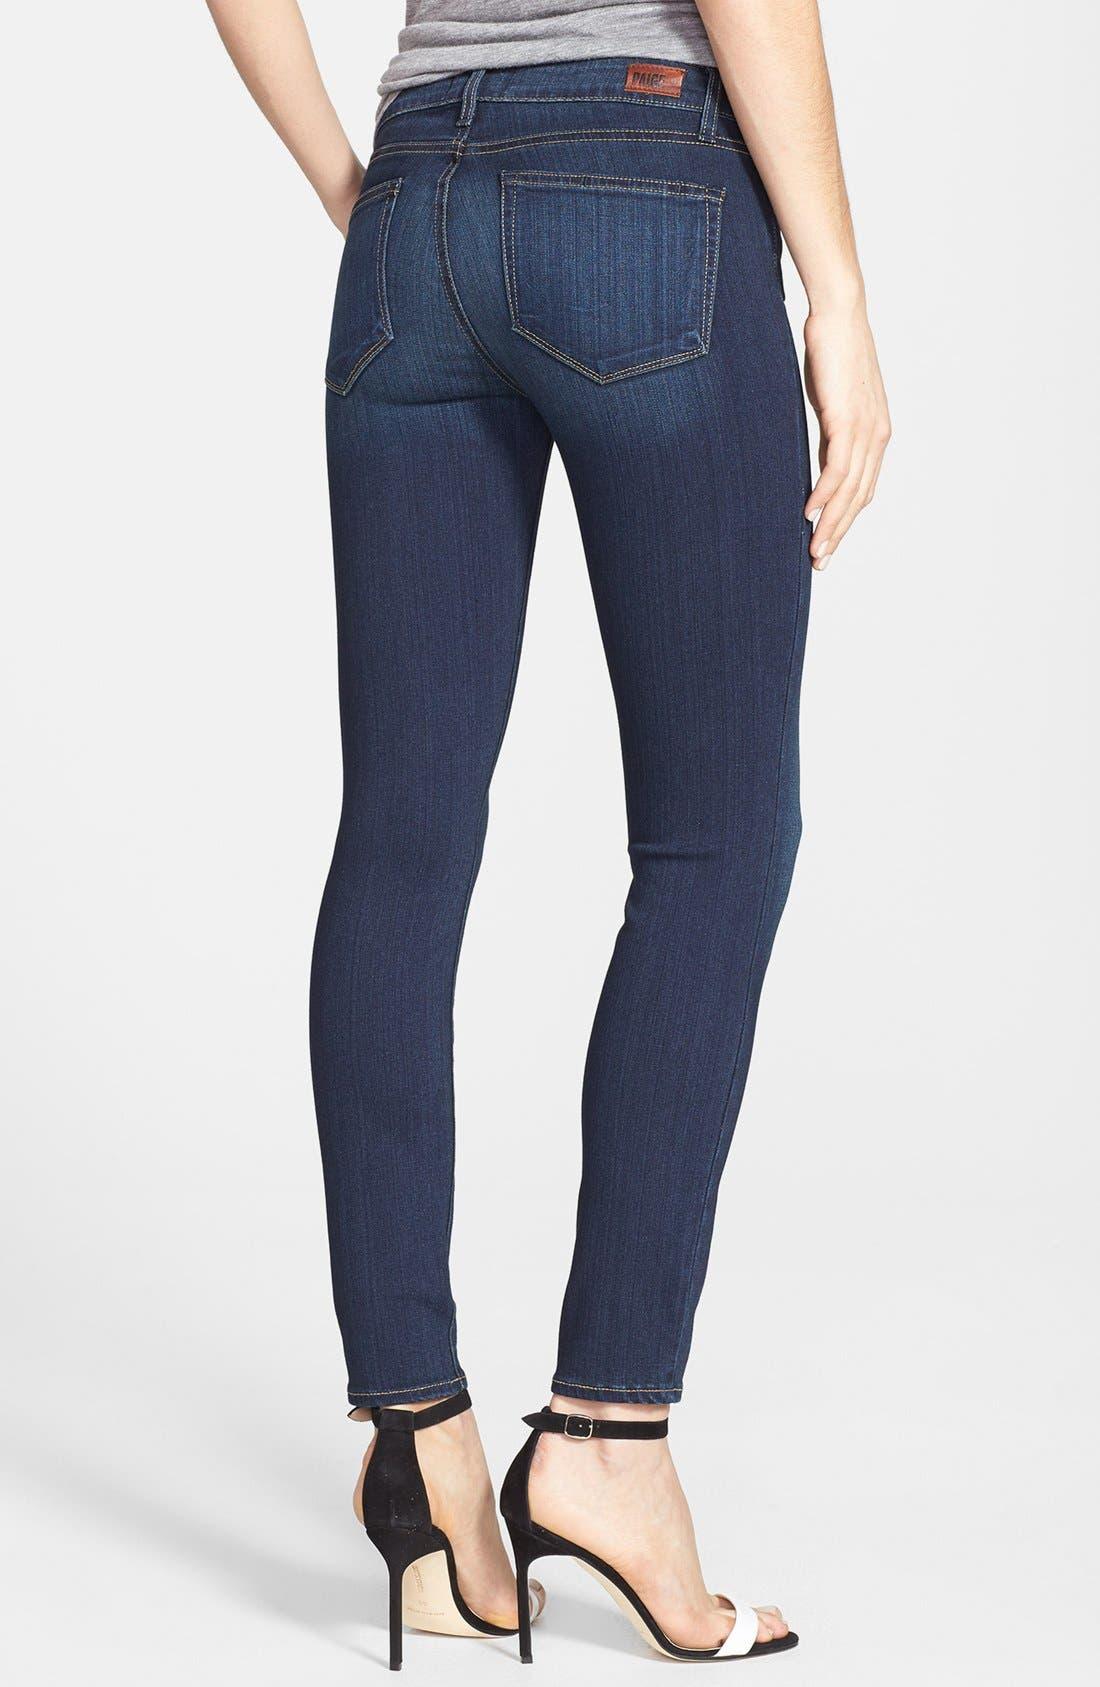 Alternate Image 3  - PAIGE Transcend - Verdugo Ankle Skinny Jeans (Nottingham)